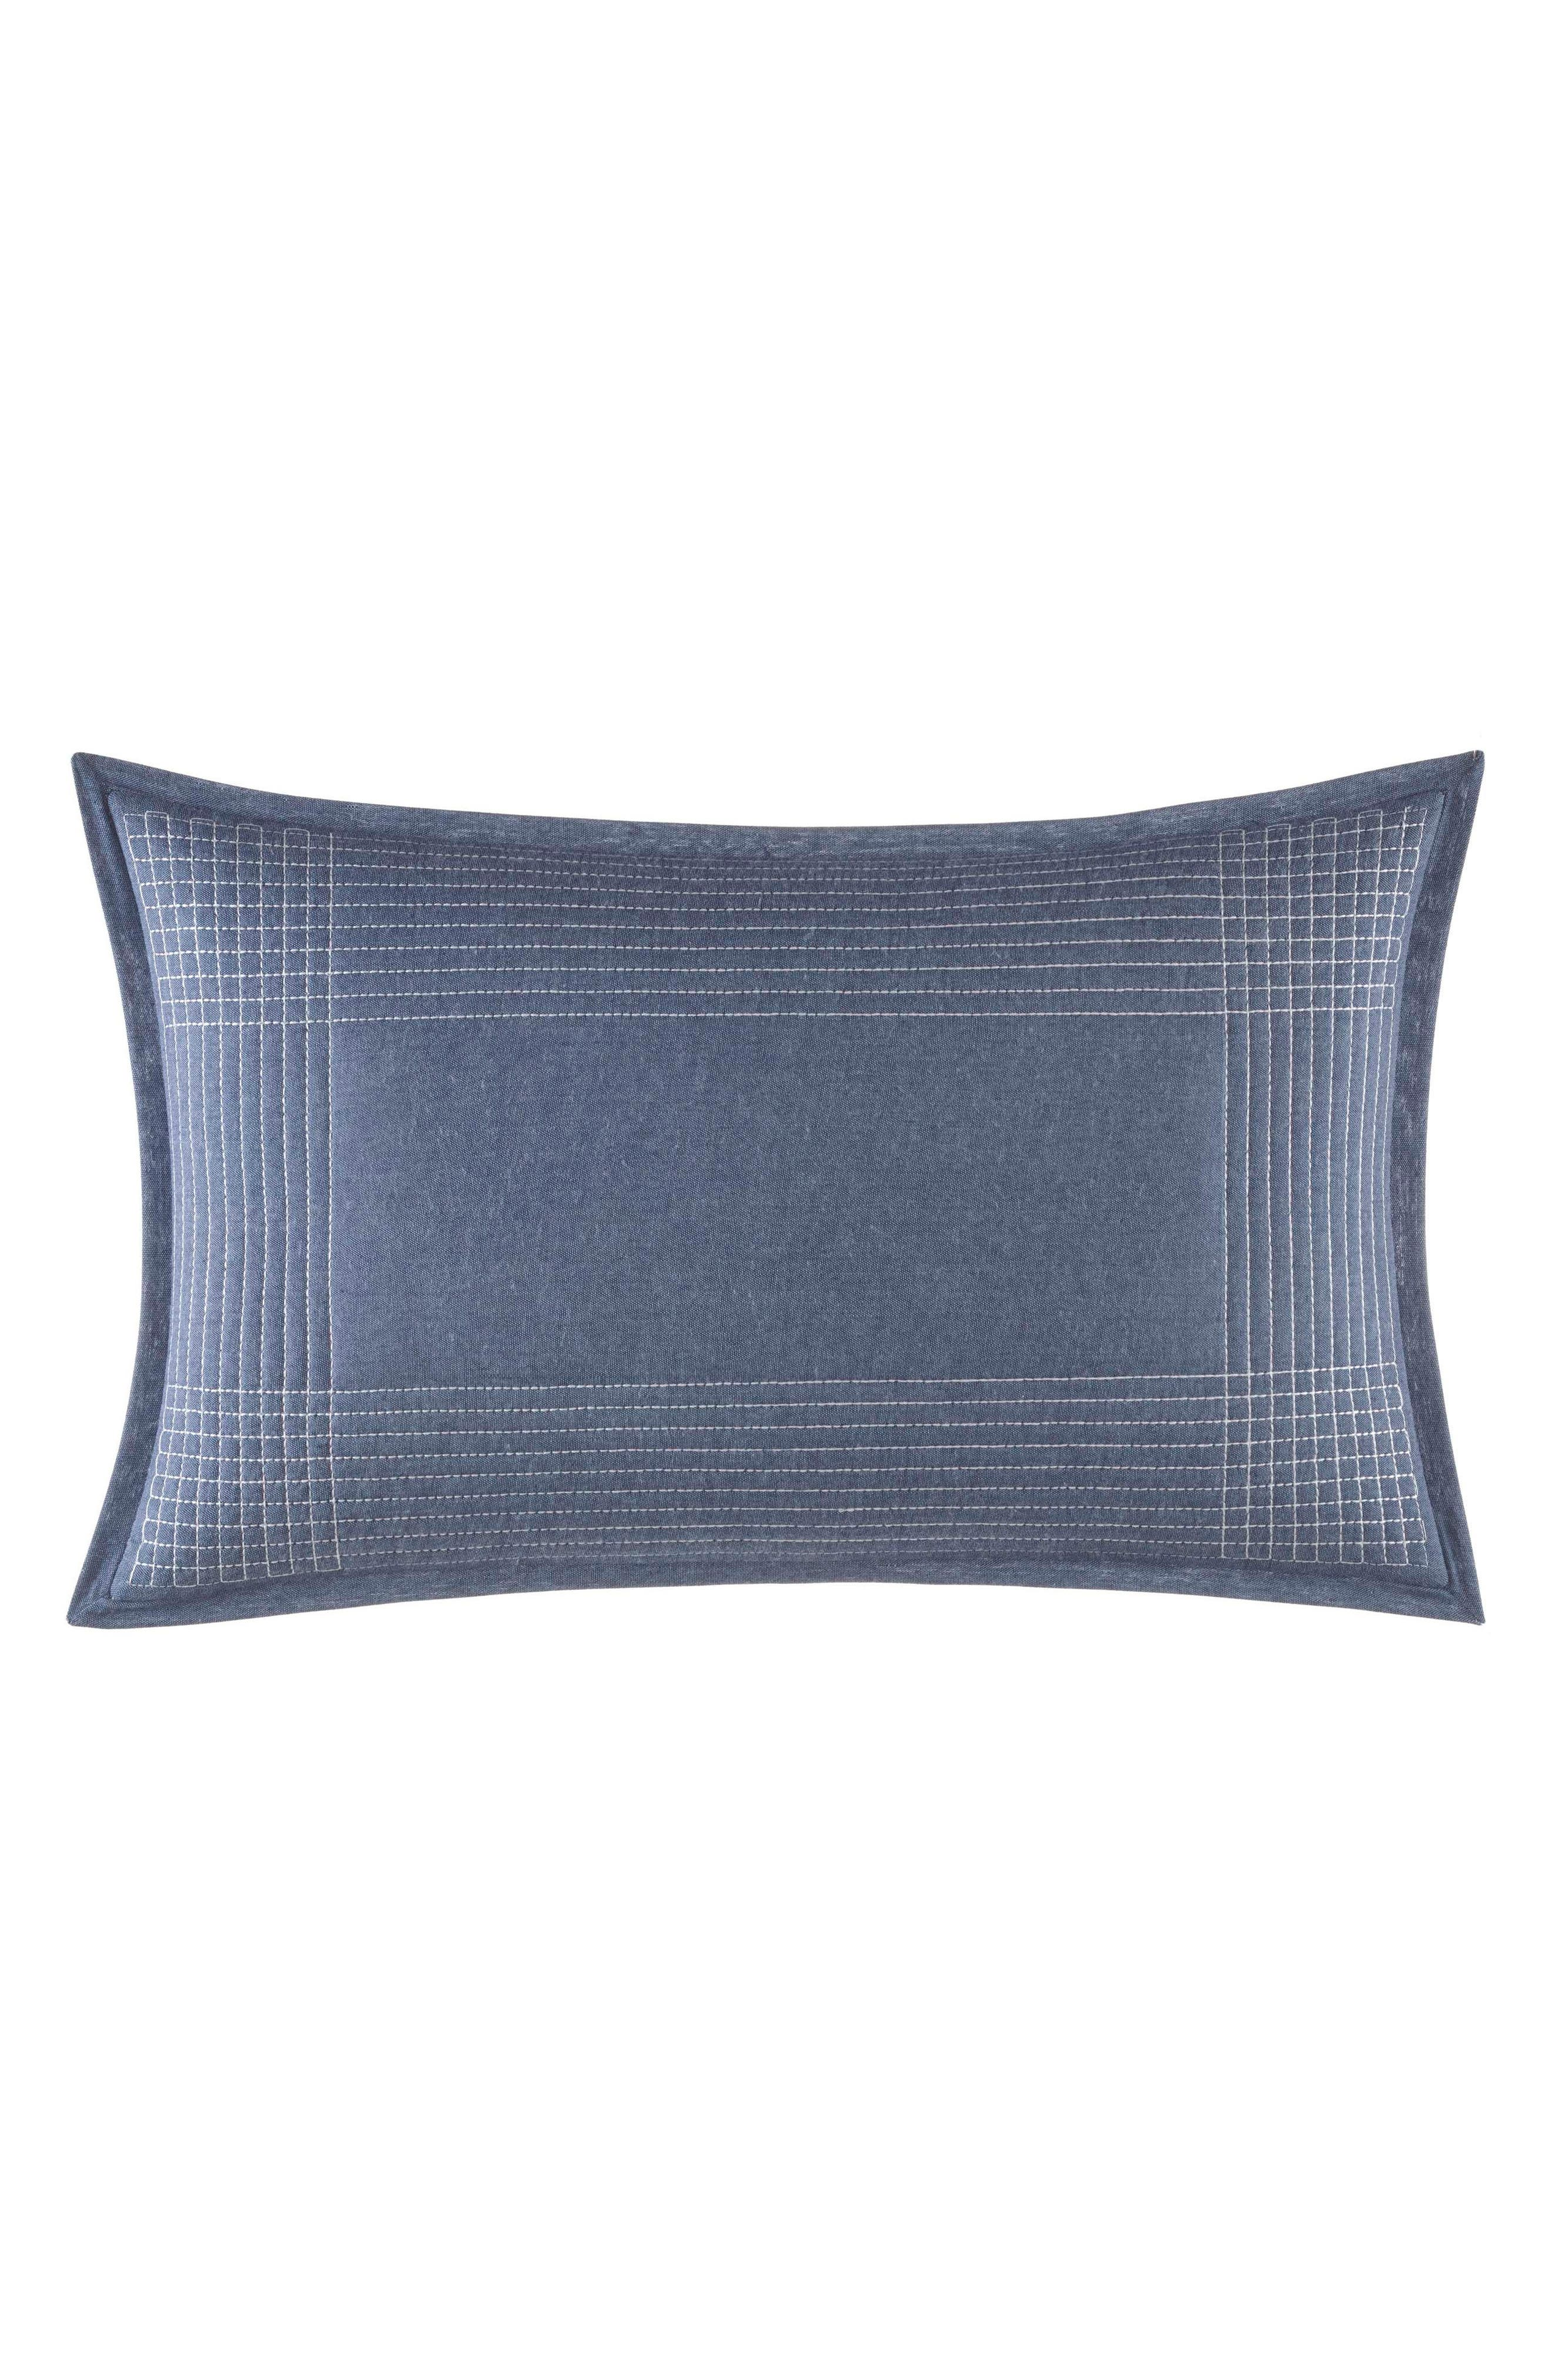 Norwich Stitched Accent Pillow,                             Main thumbnail 1, color,                             Medium Blue